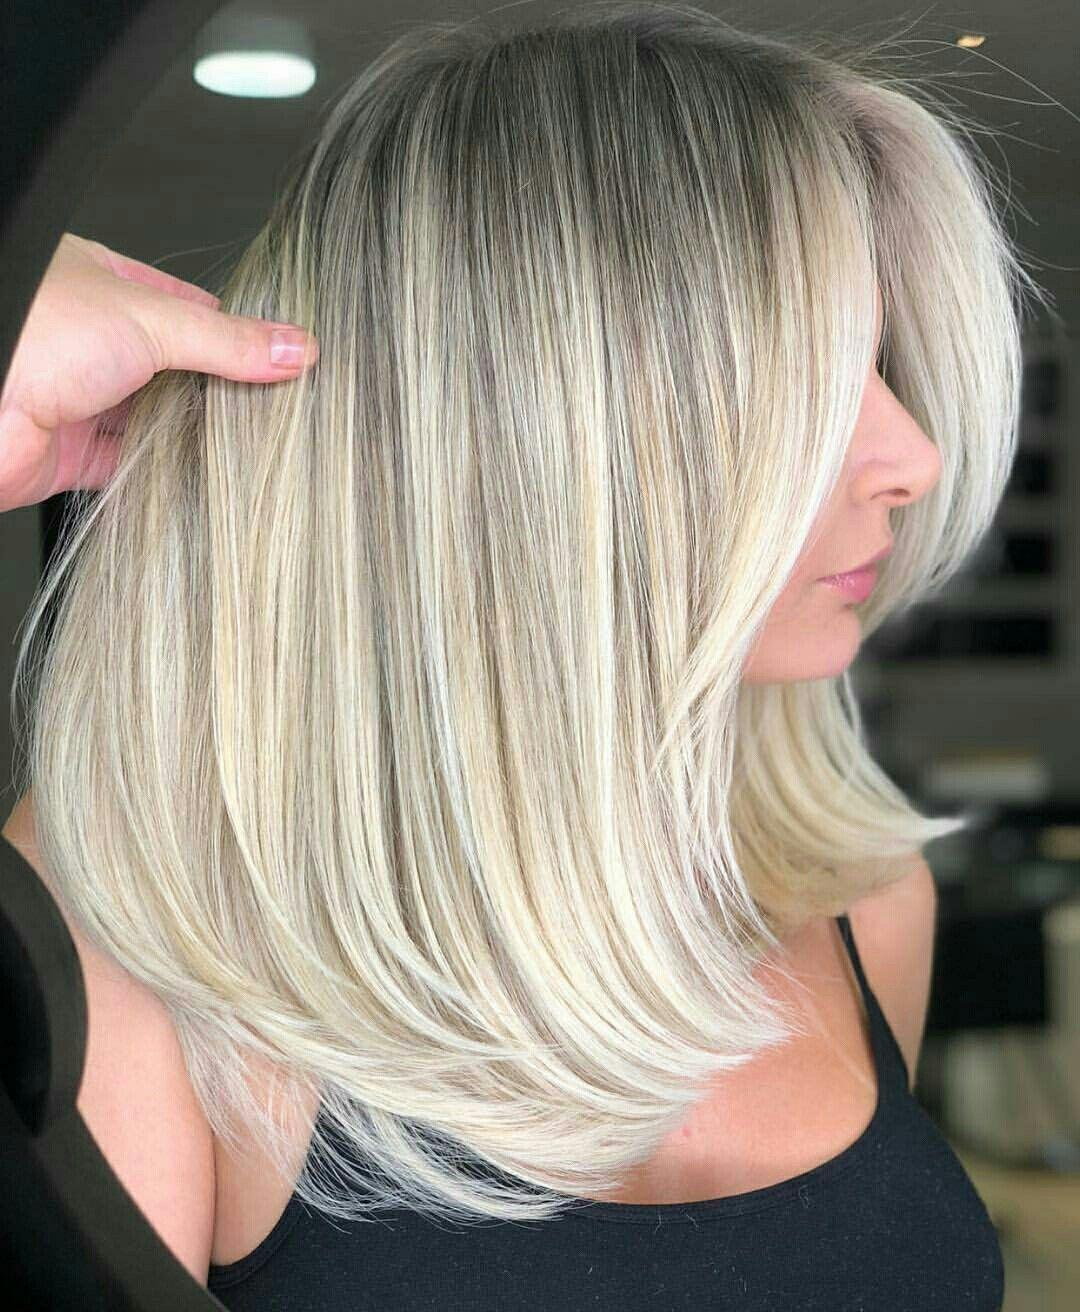 Pin By Ke Dee On Medium Hair Styles Pinterest Hair Styles